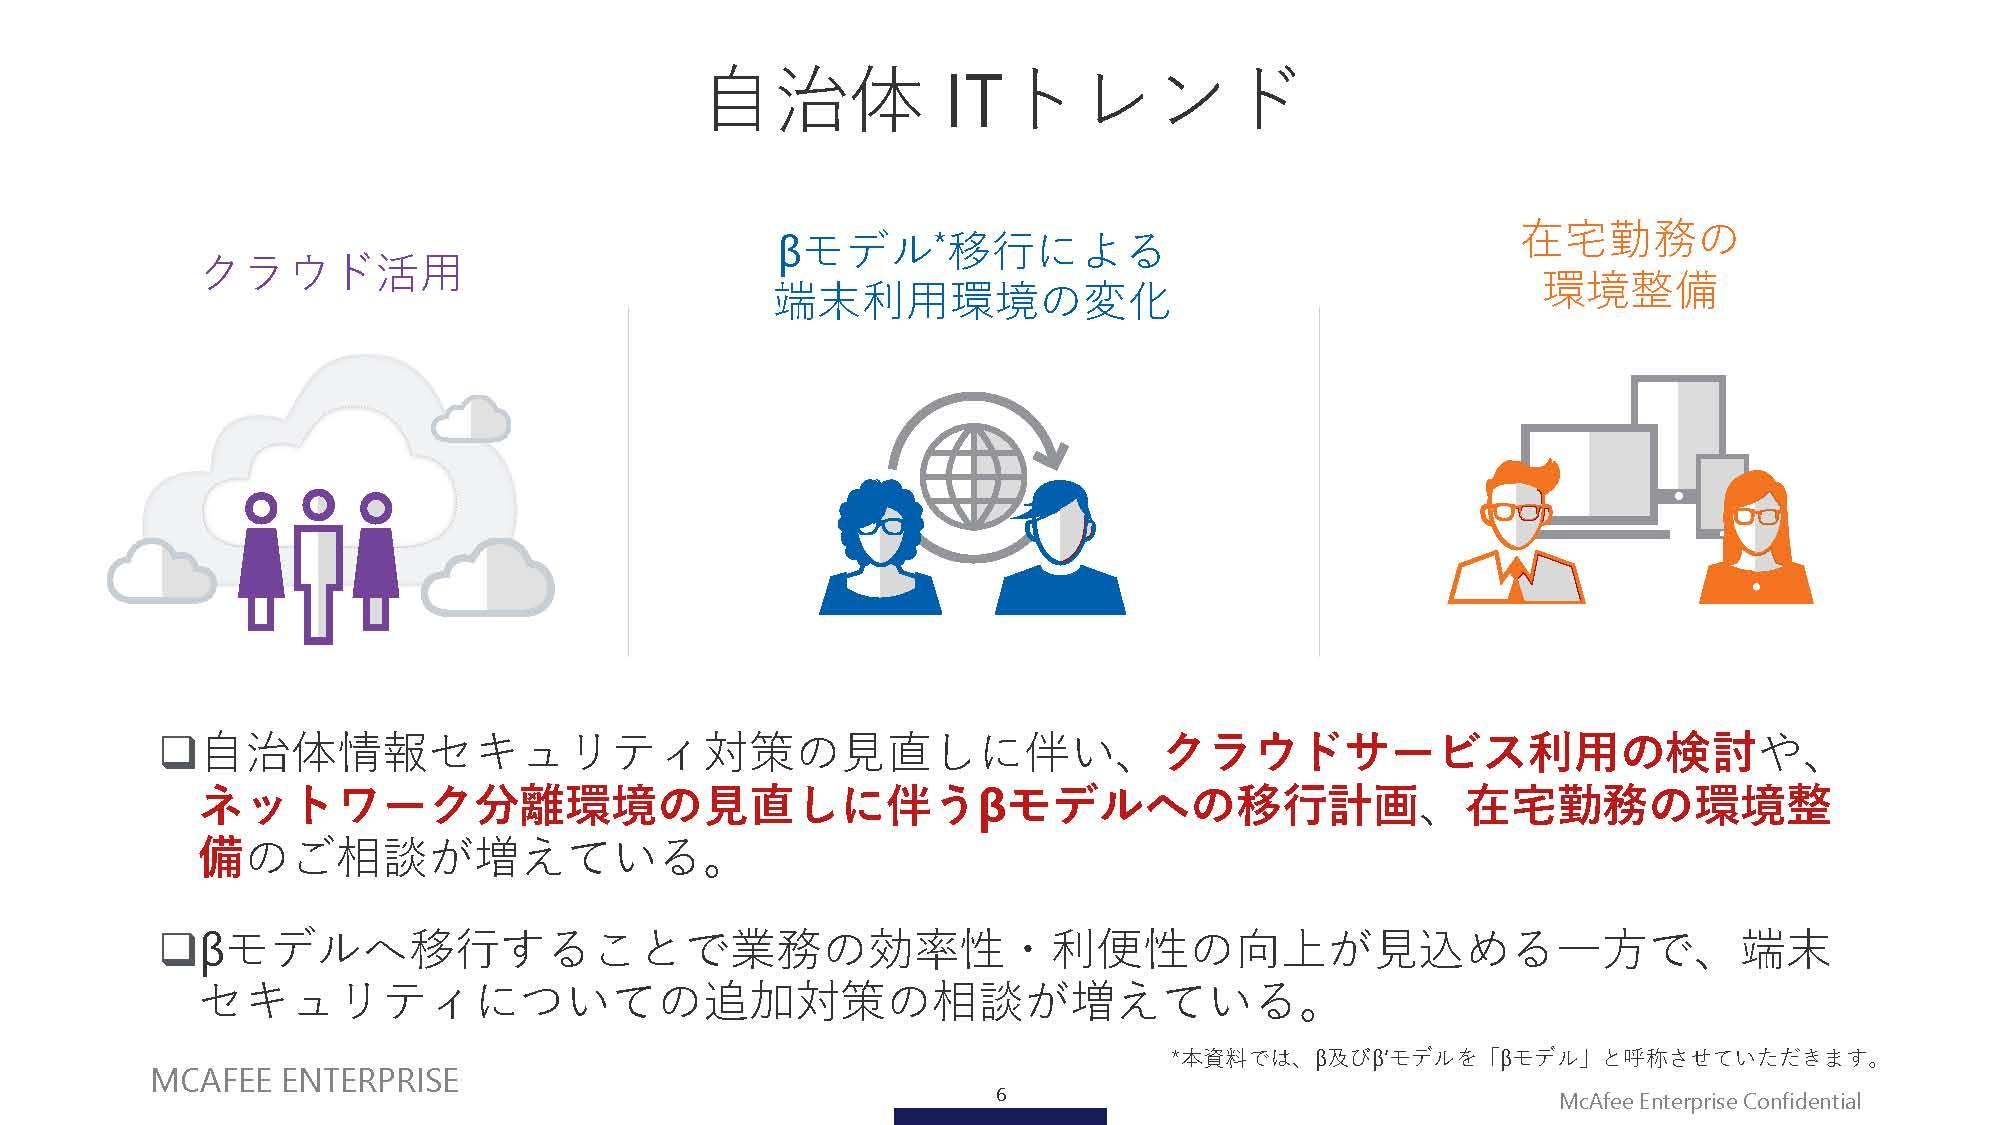 C:\Users\lma-Five\Desktop\オーバル セミレポ\採用画像jpg\5-06.jpg